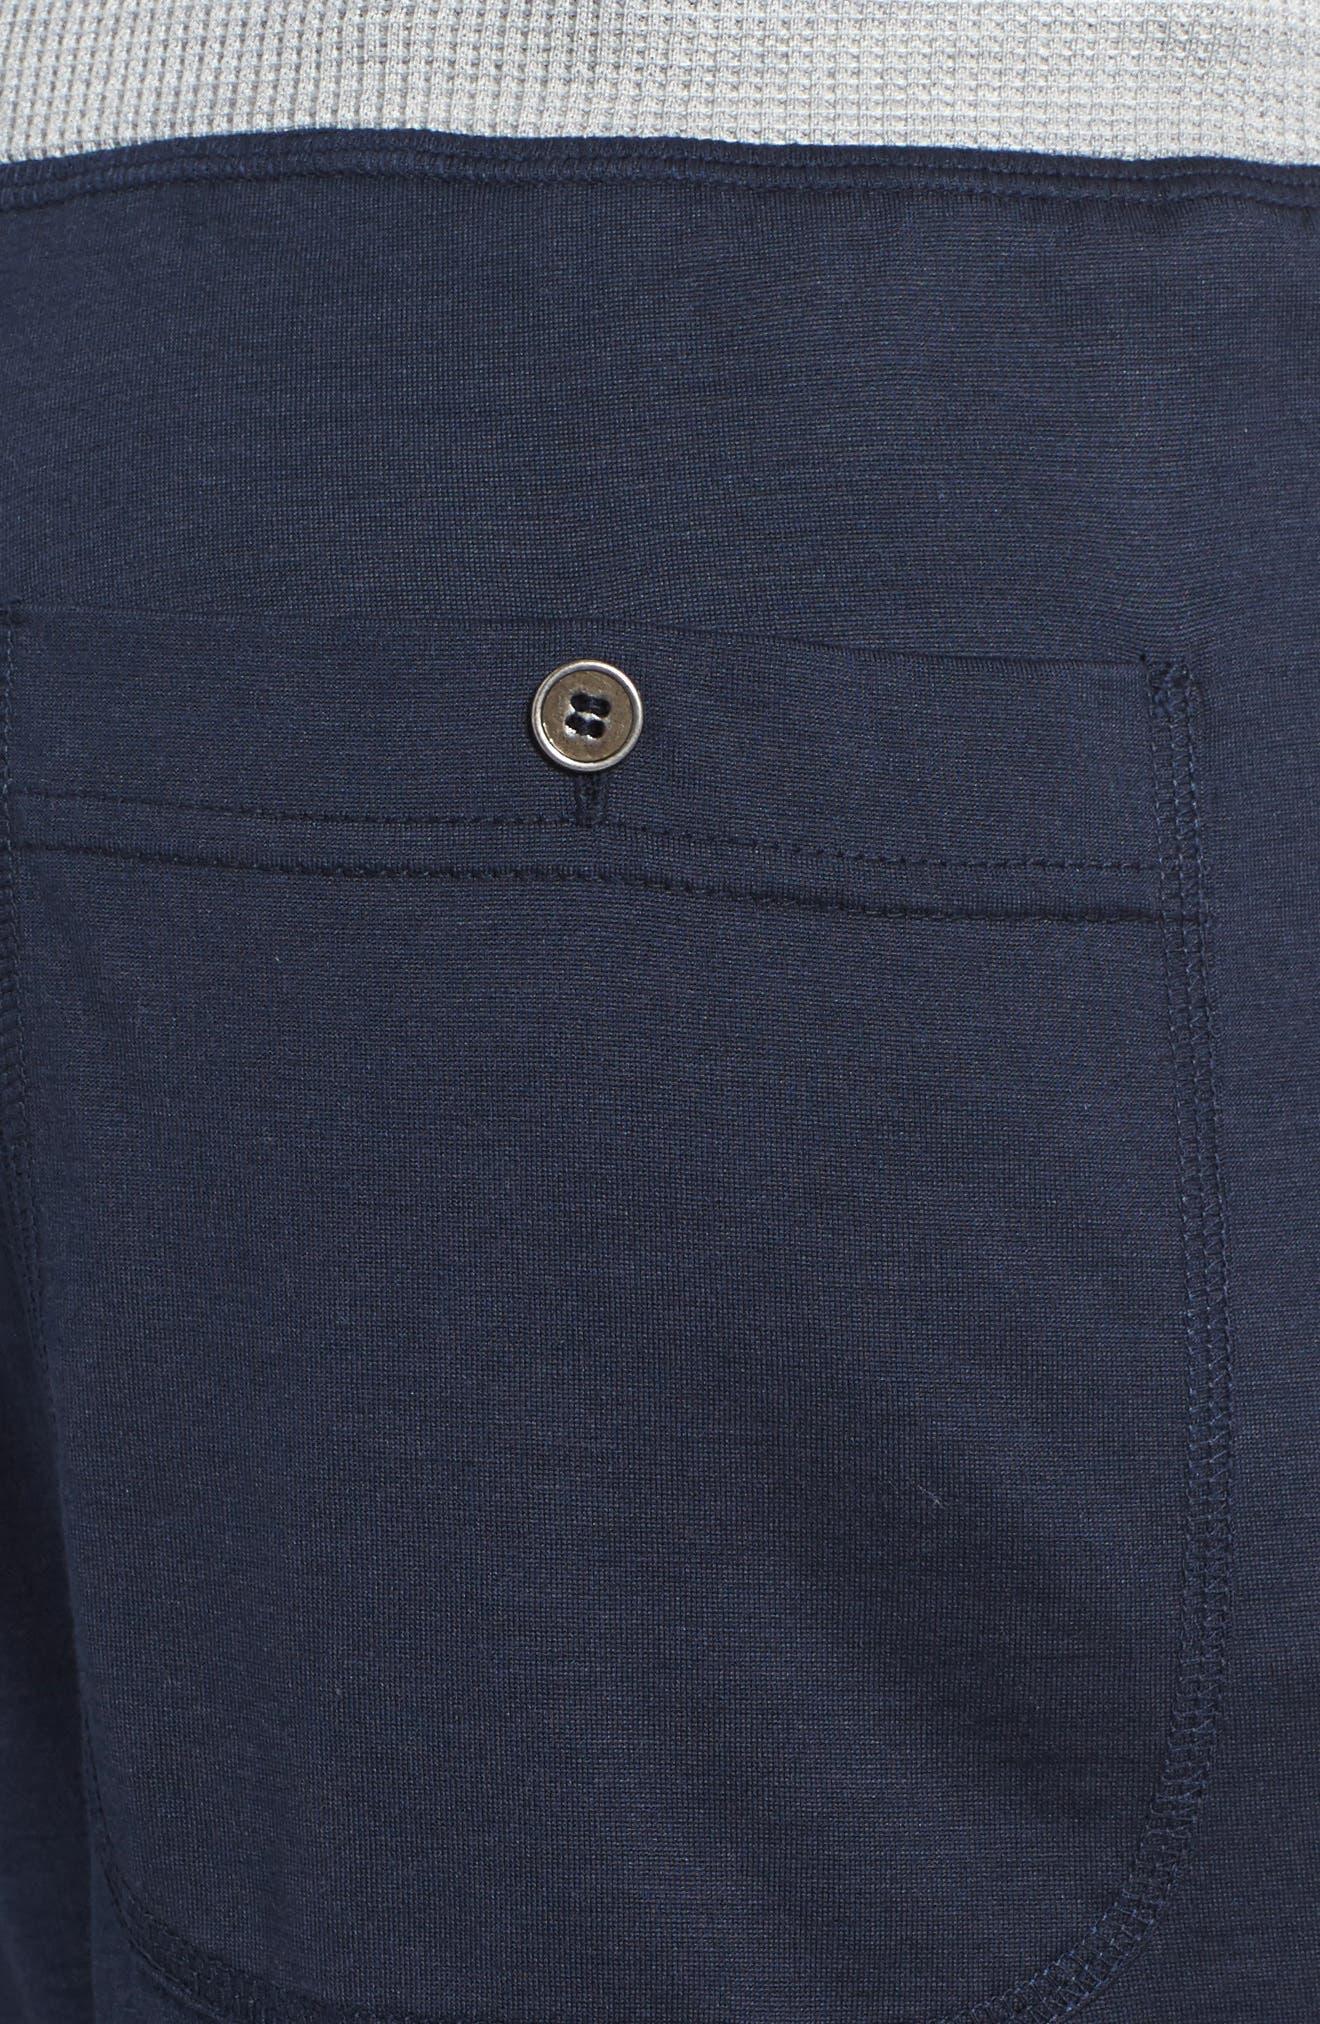 Silk & Cotton Lounge Shorts,                             Alternate thumbnail 4, color,                             409